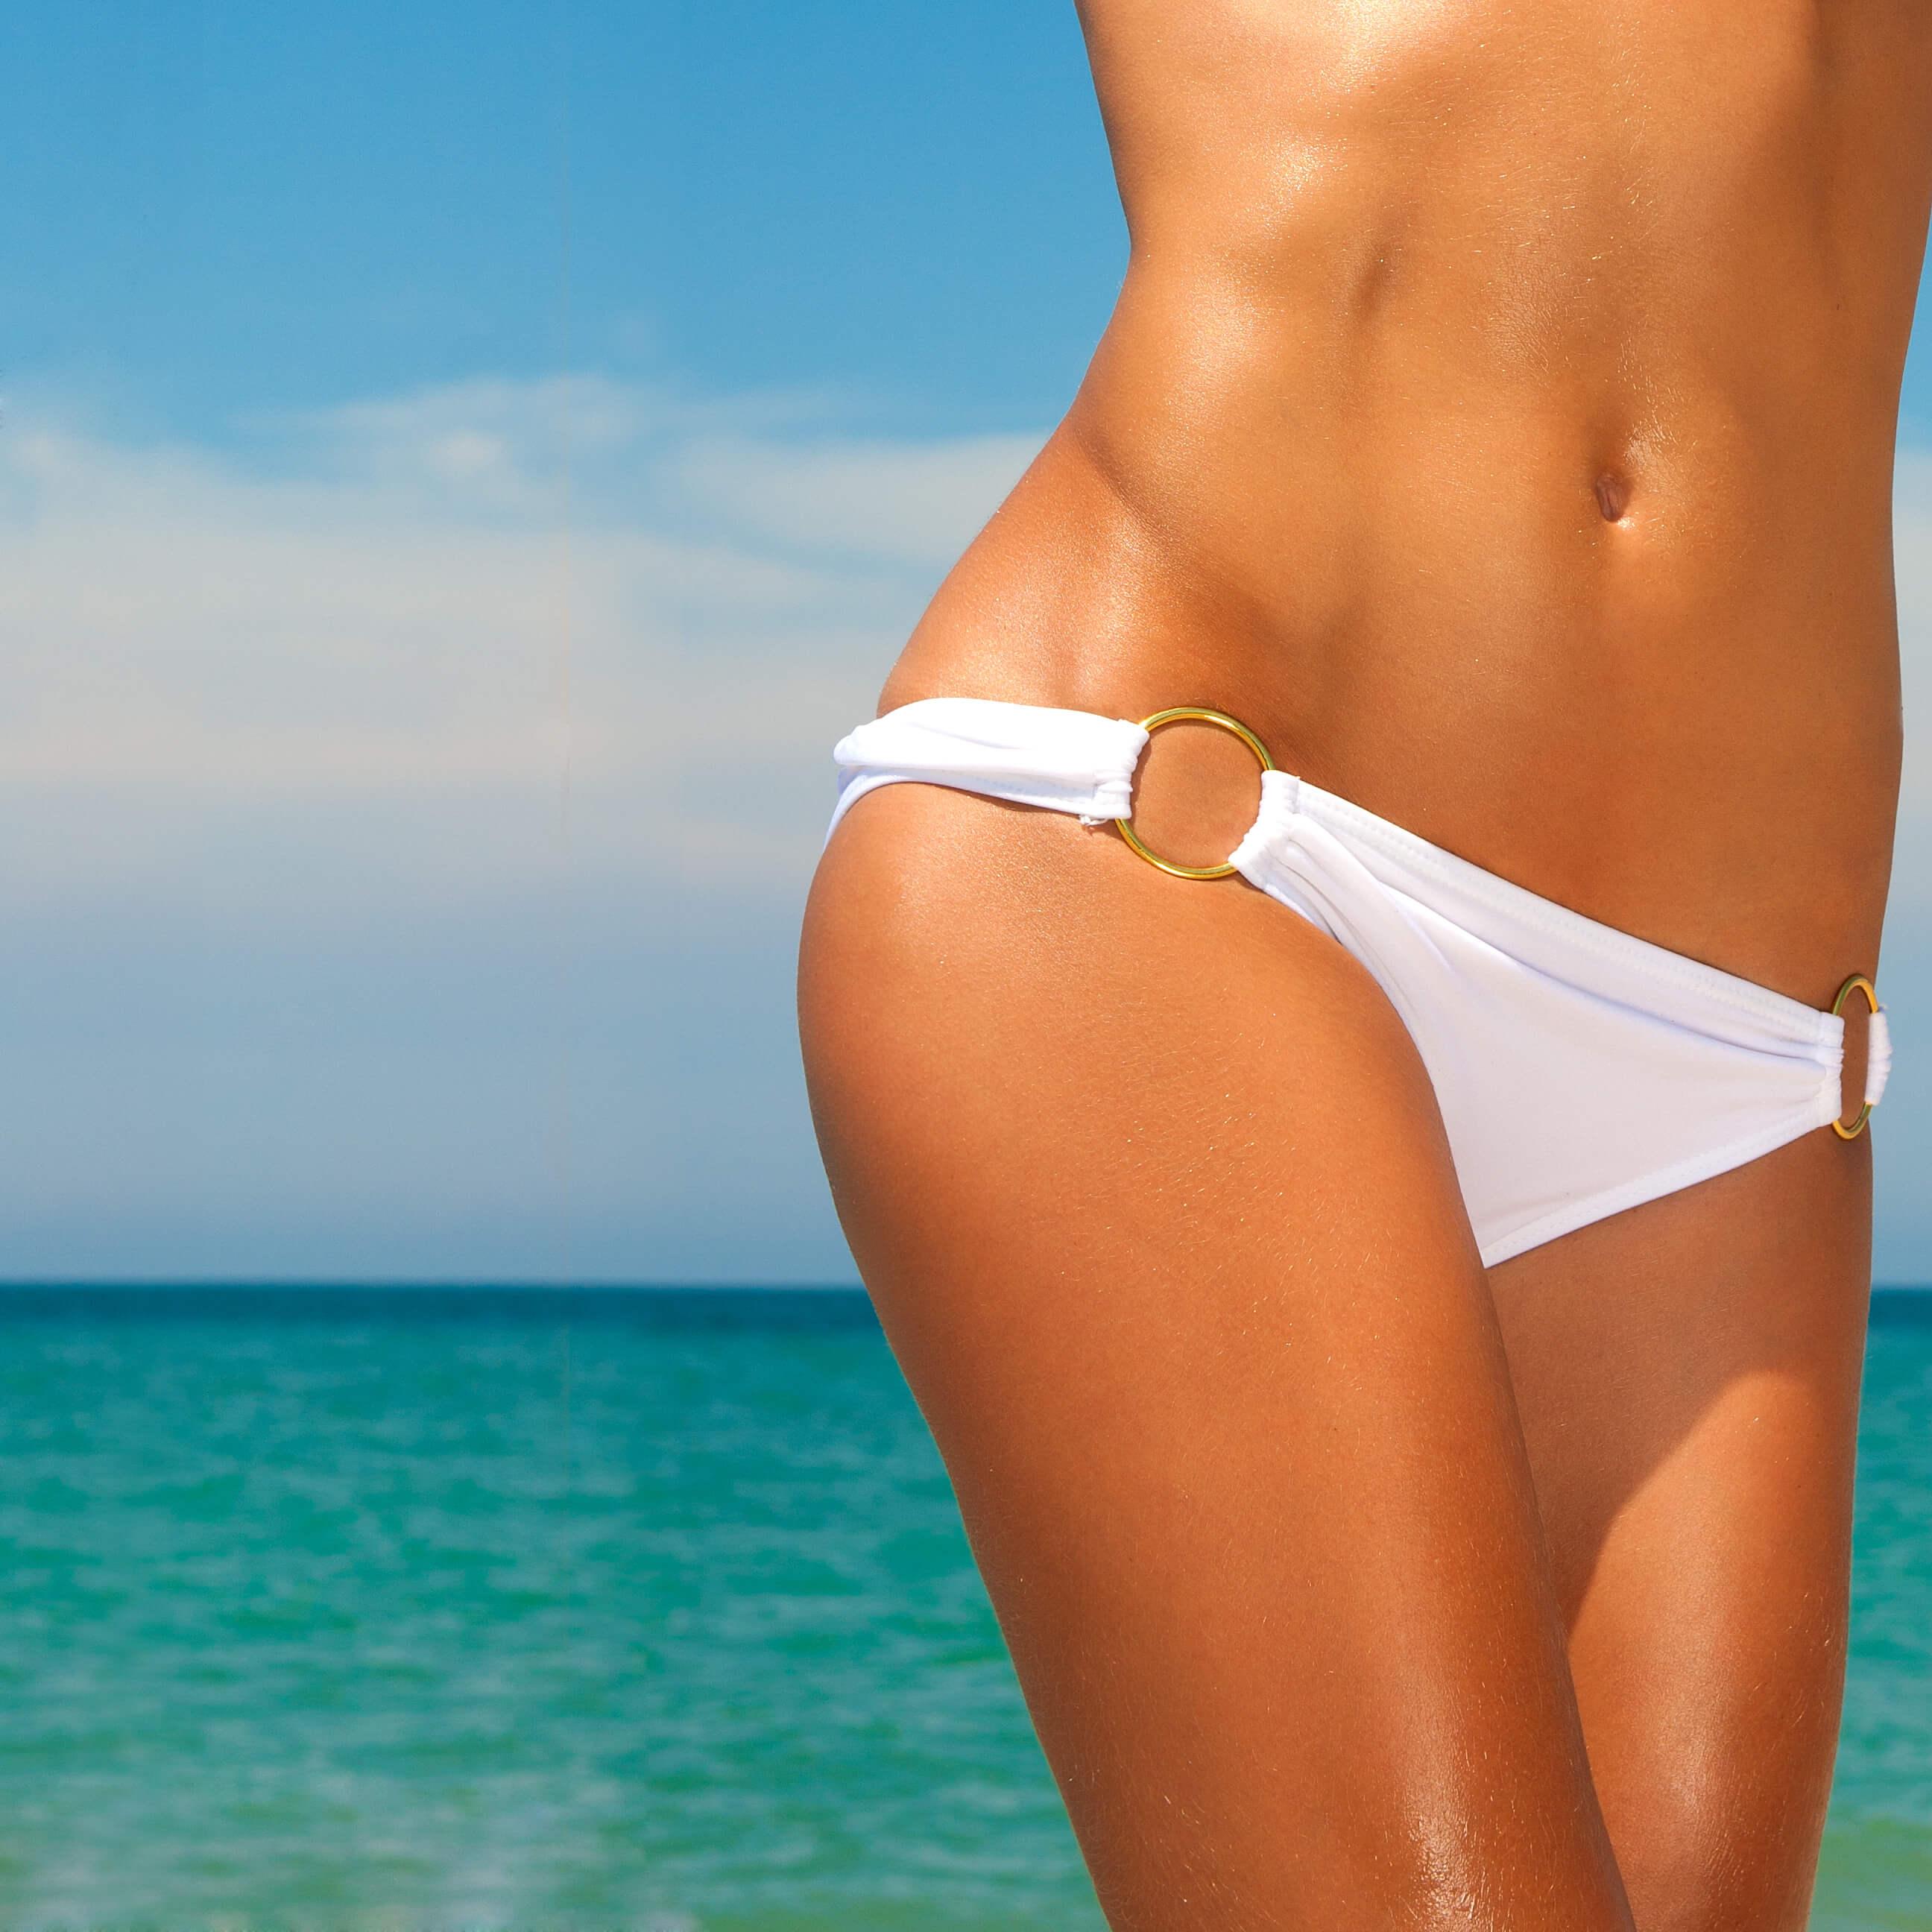 Quantashape Skin Tightening: Rock Bottom Ain't So Bad!